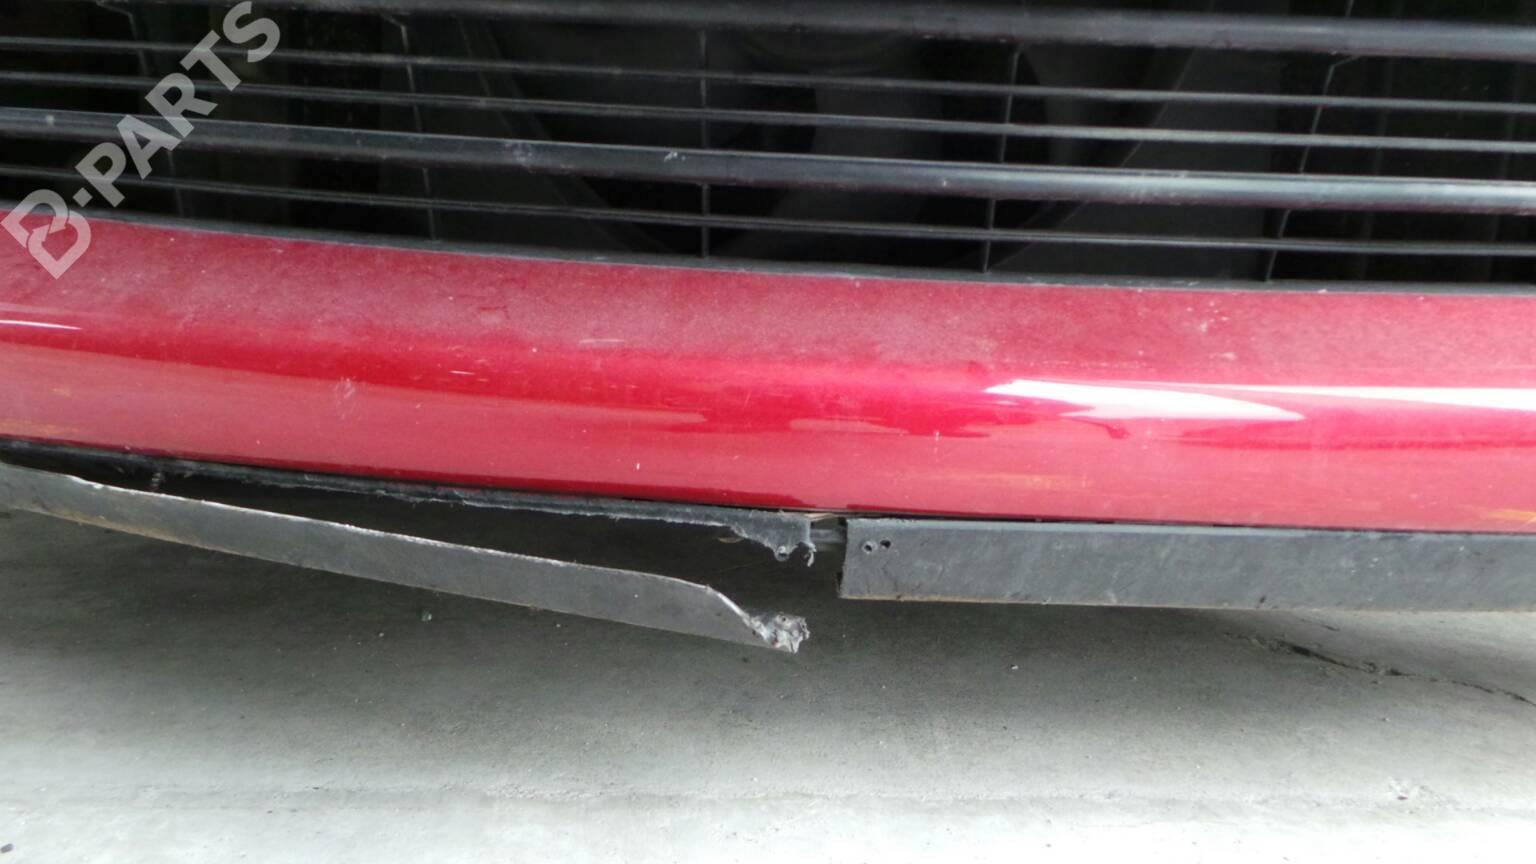 Front Bumper Peugeot 306 Convertible 7d N3 N5 18 128683 Fuse Box Brake Lights 182